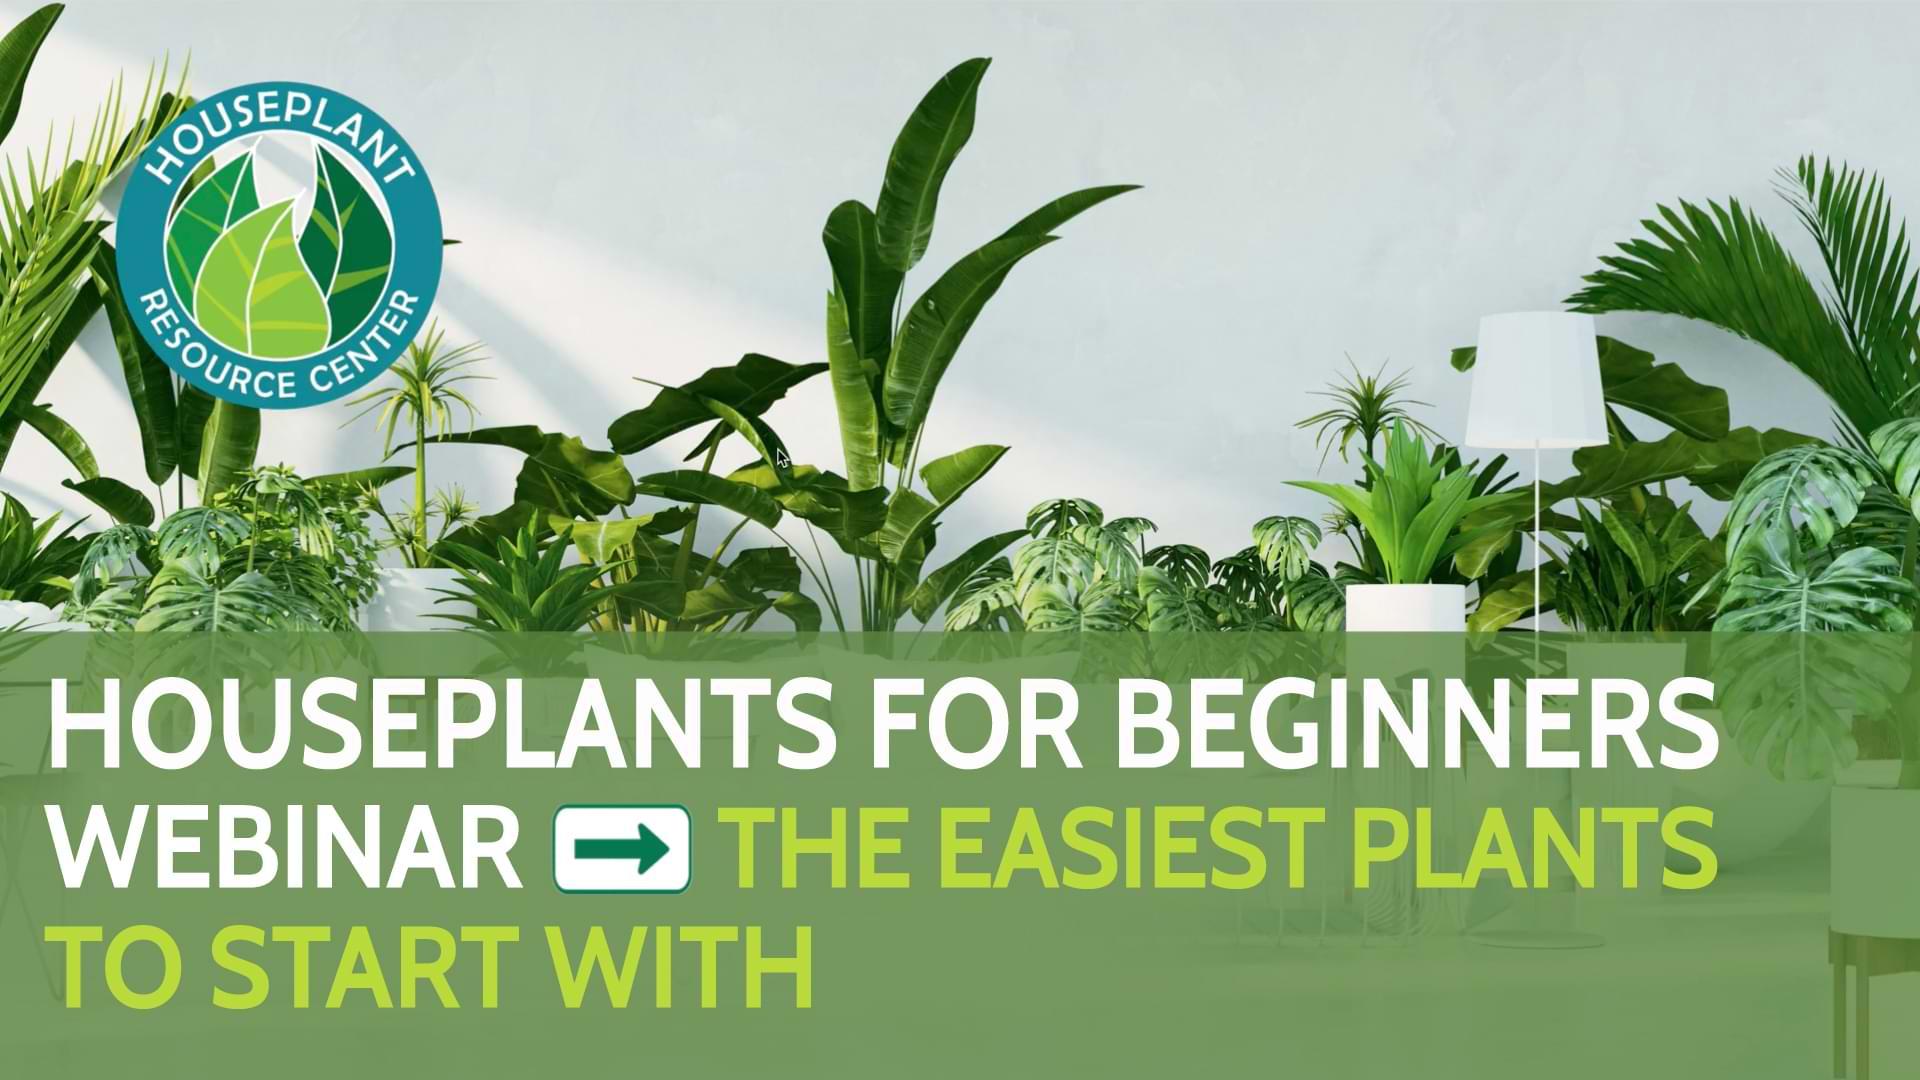 Houseplants For Beginners Webinar New